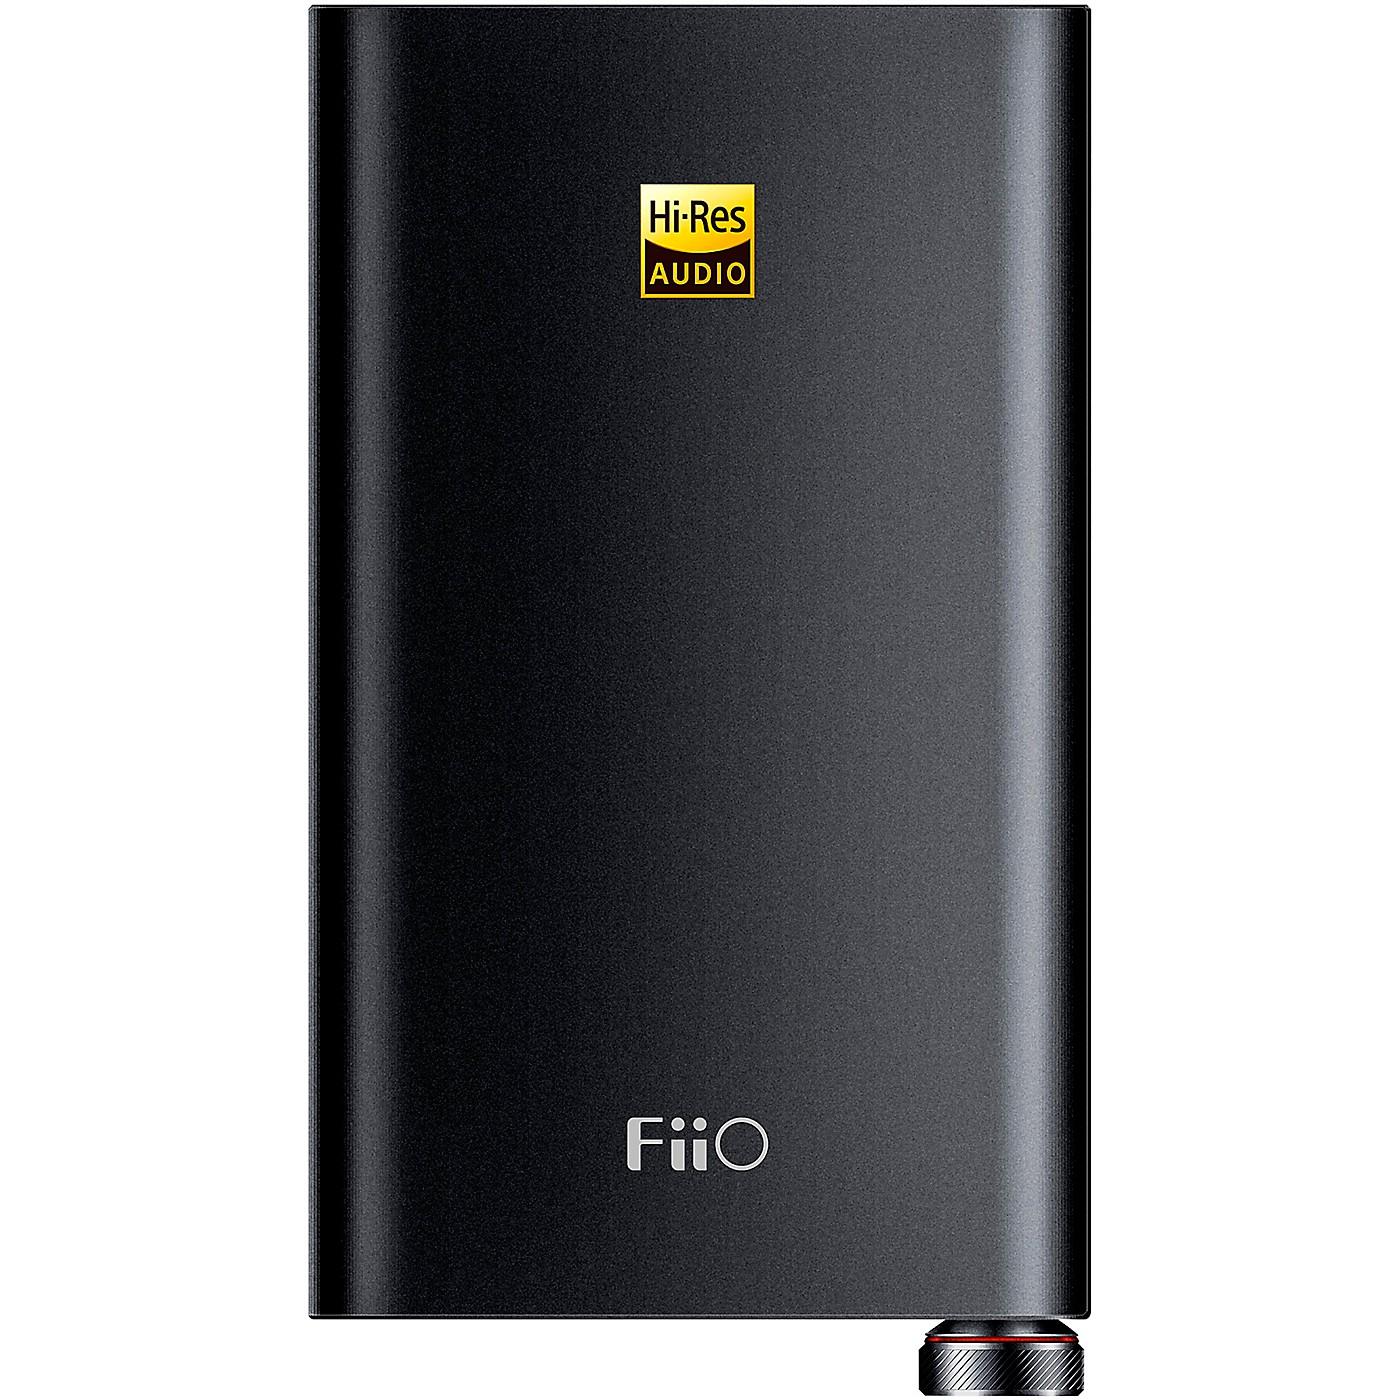 FiiO Q1-II Portable USB DAC and Headphone Amp—Native DSD DAC/Amp for iPhone thumbnail